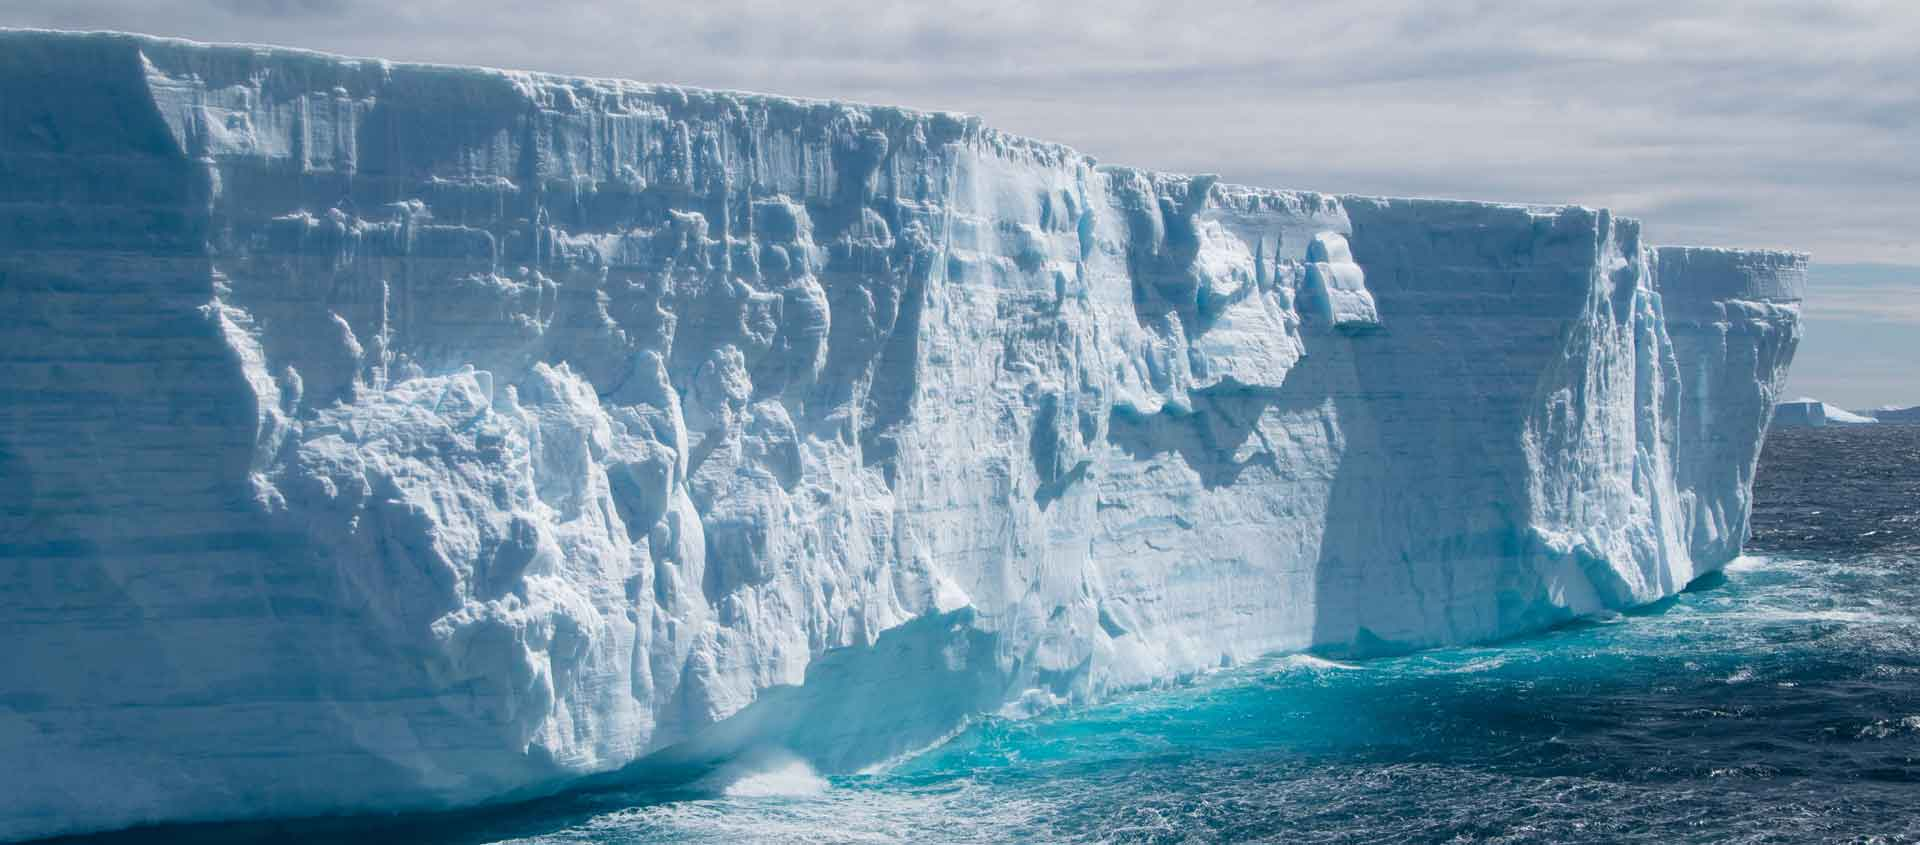 Deep South Antarctica cruise image of giant iceberg